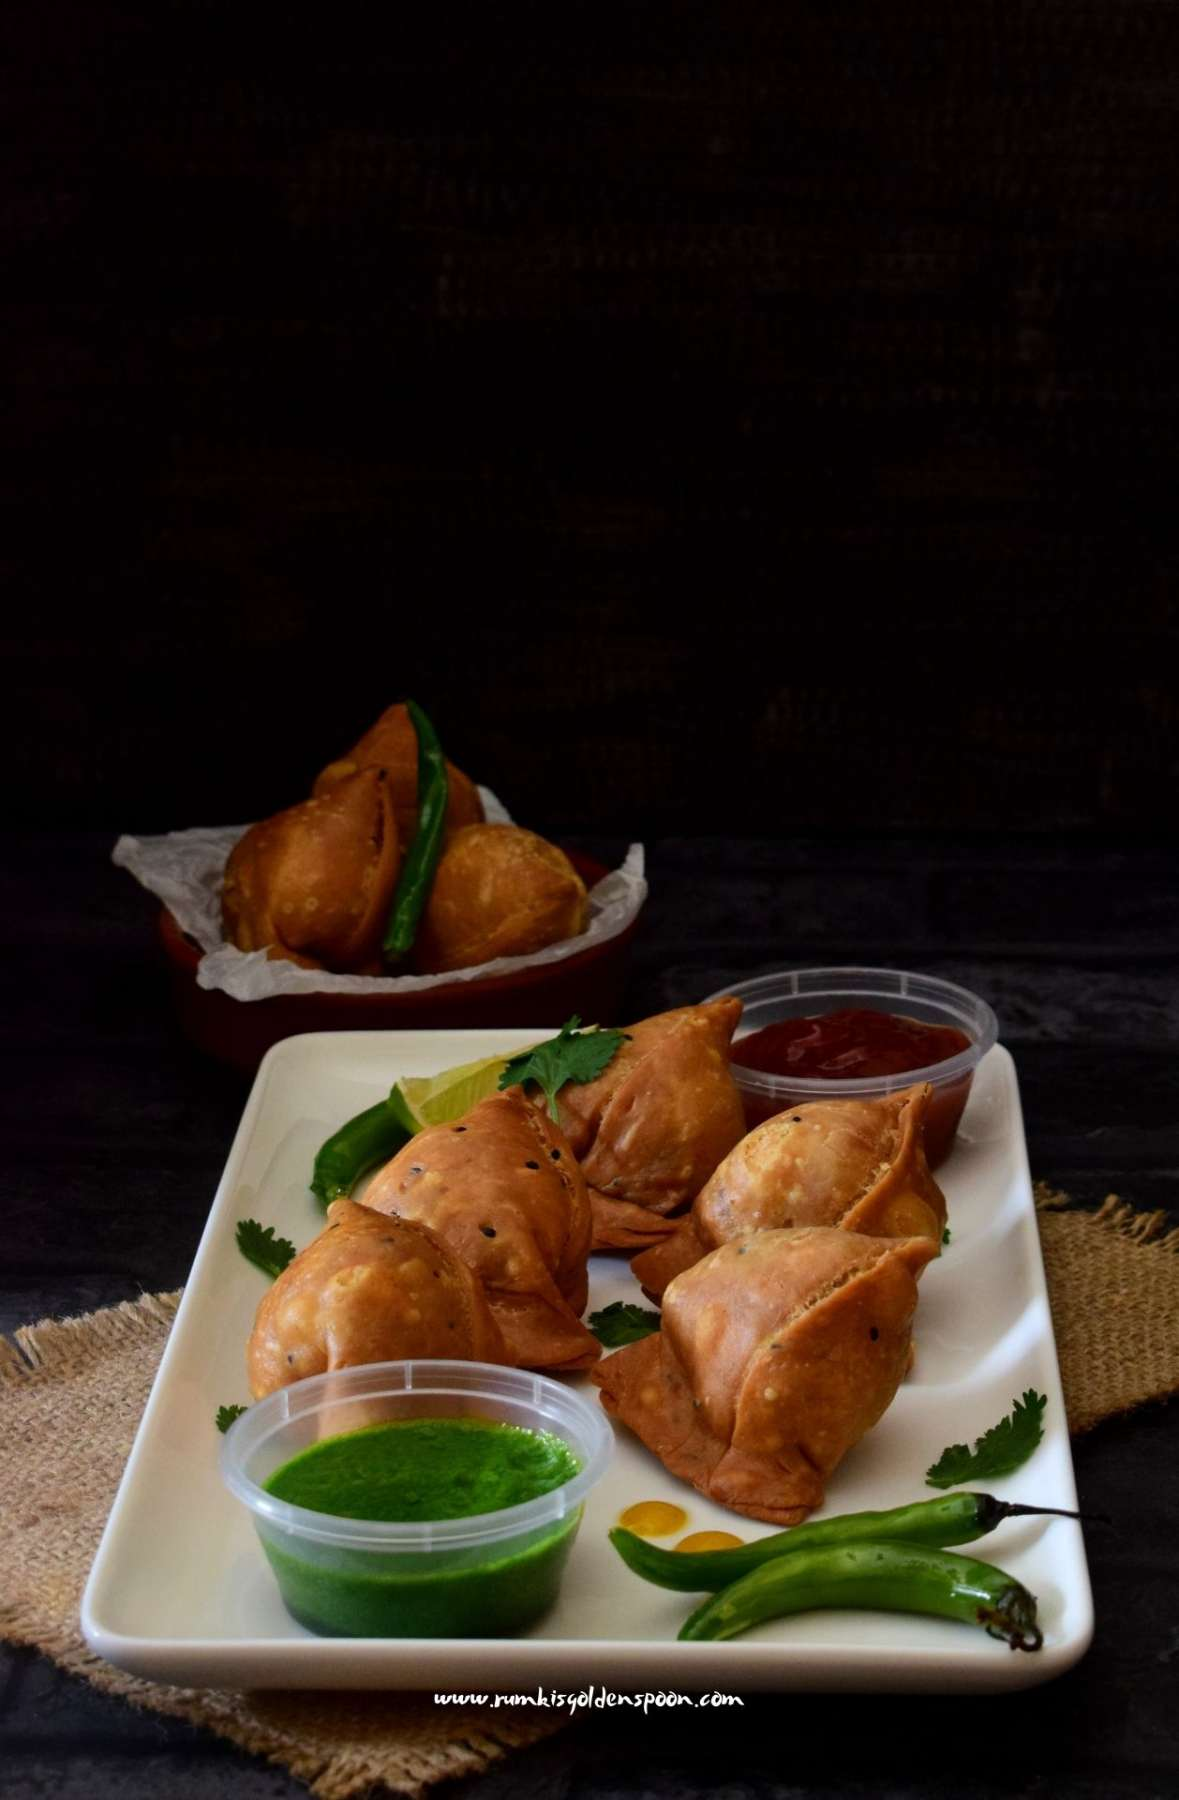 bengali samosa, bengali samosa recipe, bengali singara recipe, shingara recipe, singara recipe bengali, aloo singara recipe, homemade singara recipe, kolkata singara recipe, samosa in bengali, how to make bengali samosa, kolkata street food, street food of kolkata, kolkata famous street food, kolkata street food recipe, bengali street food, vegan snacks recipe, Bengali snack recipe, Indian snack recipe, recipe for vegan snacks, no onion no garlic recipe, Indian street food, Rumki's Golden Spoon